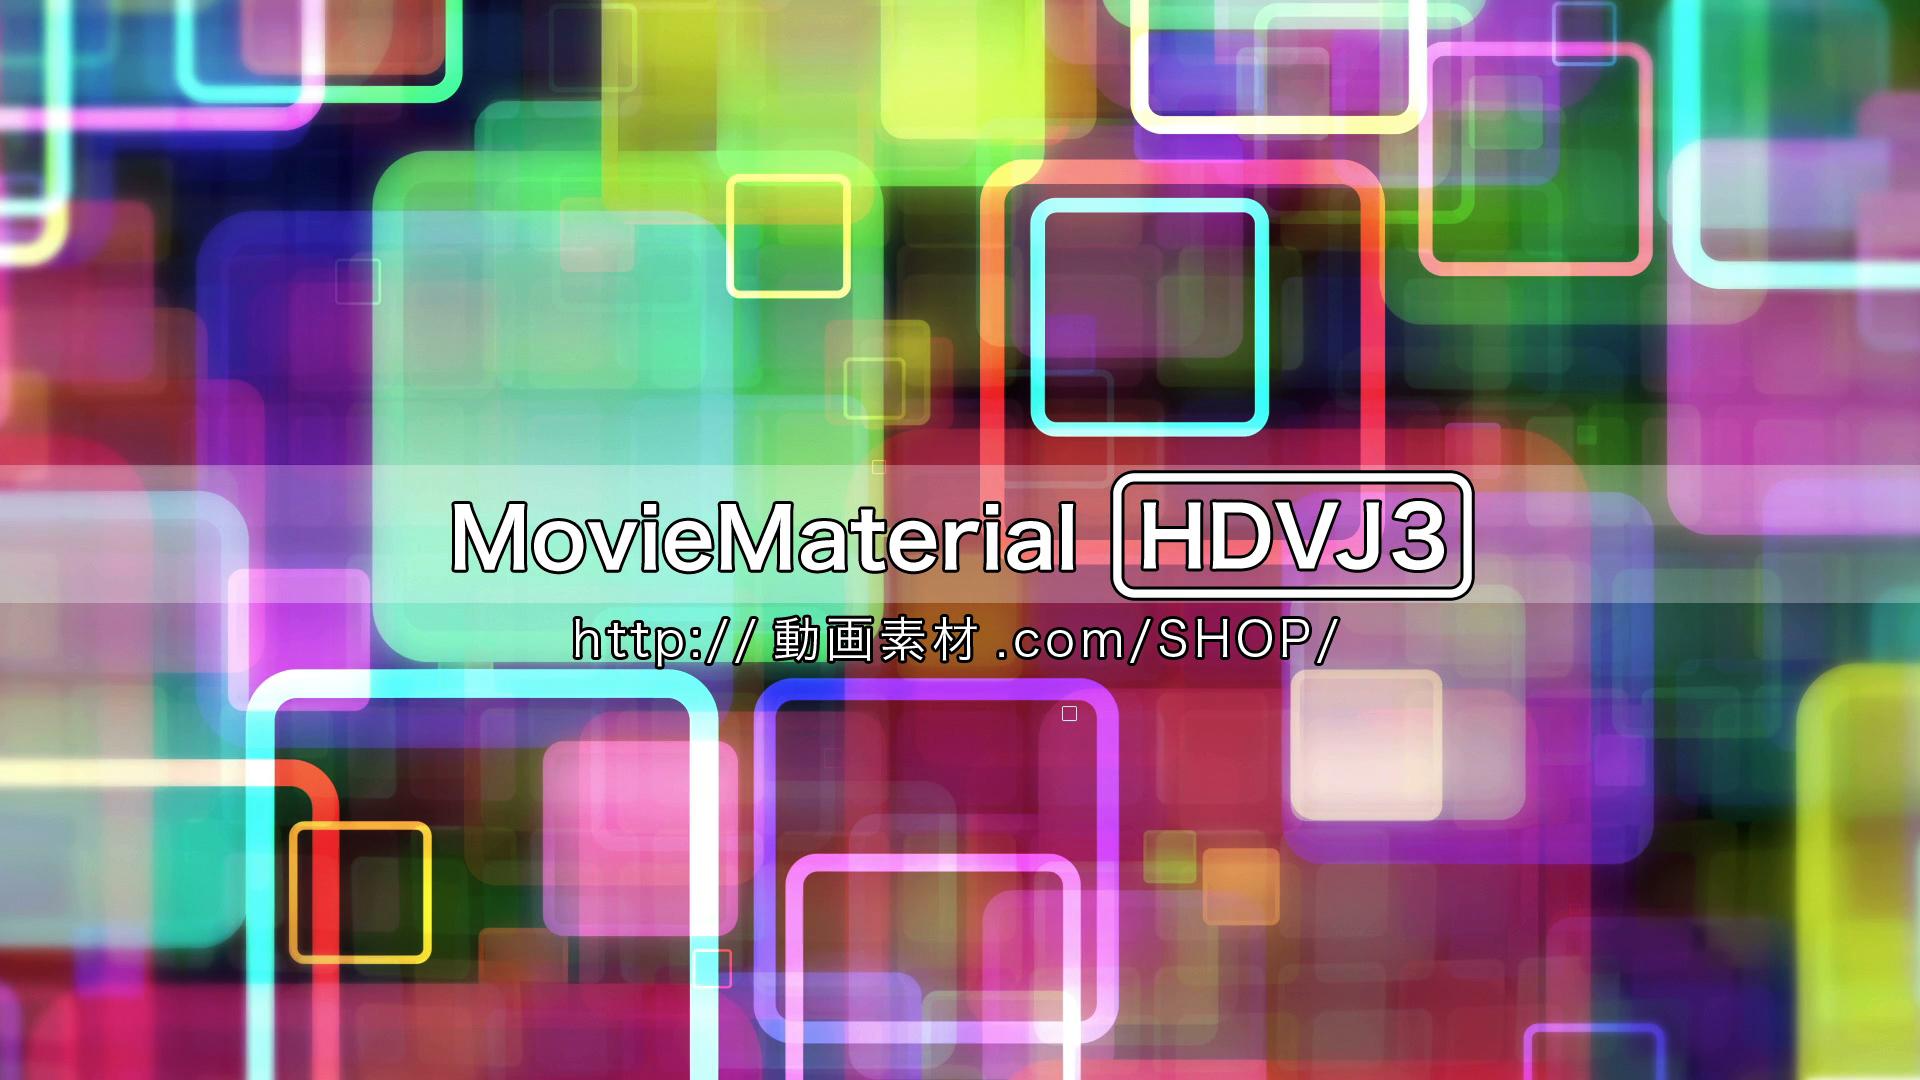 MovieMaterial HDVJ3 フルハイビジョンVJ動画素材集 画像3